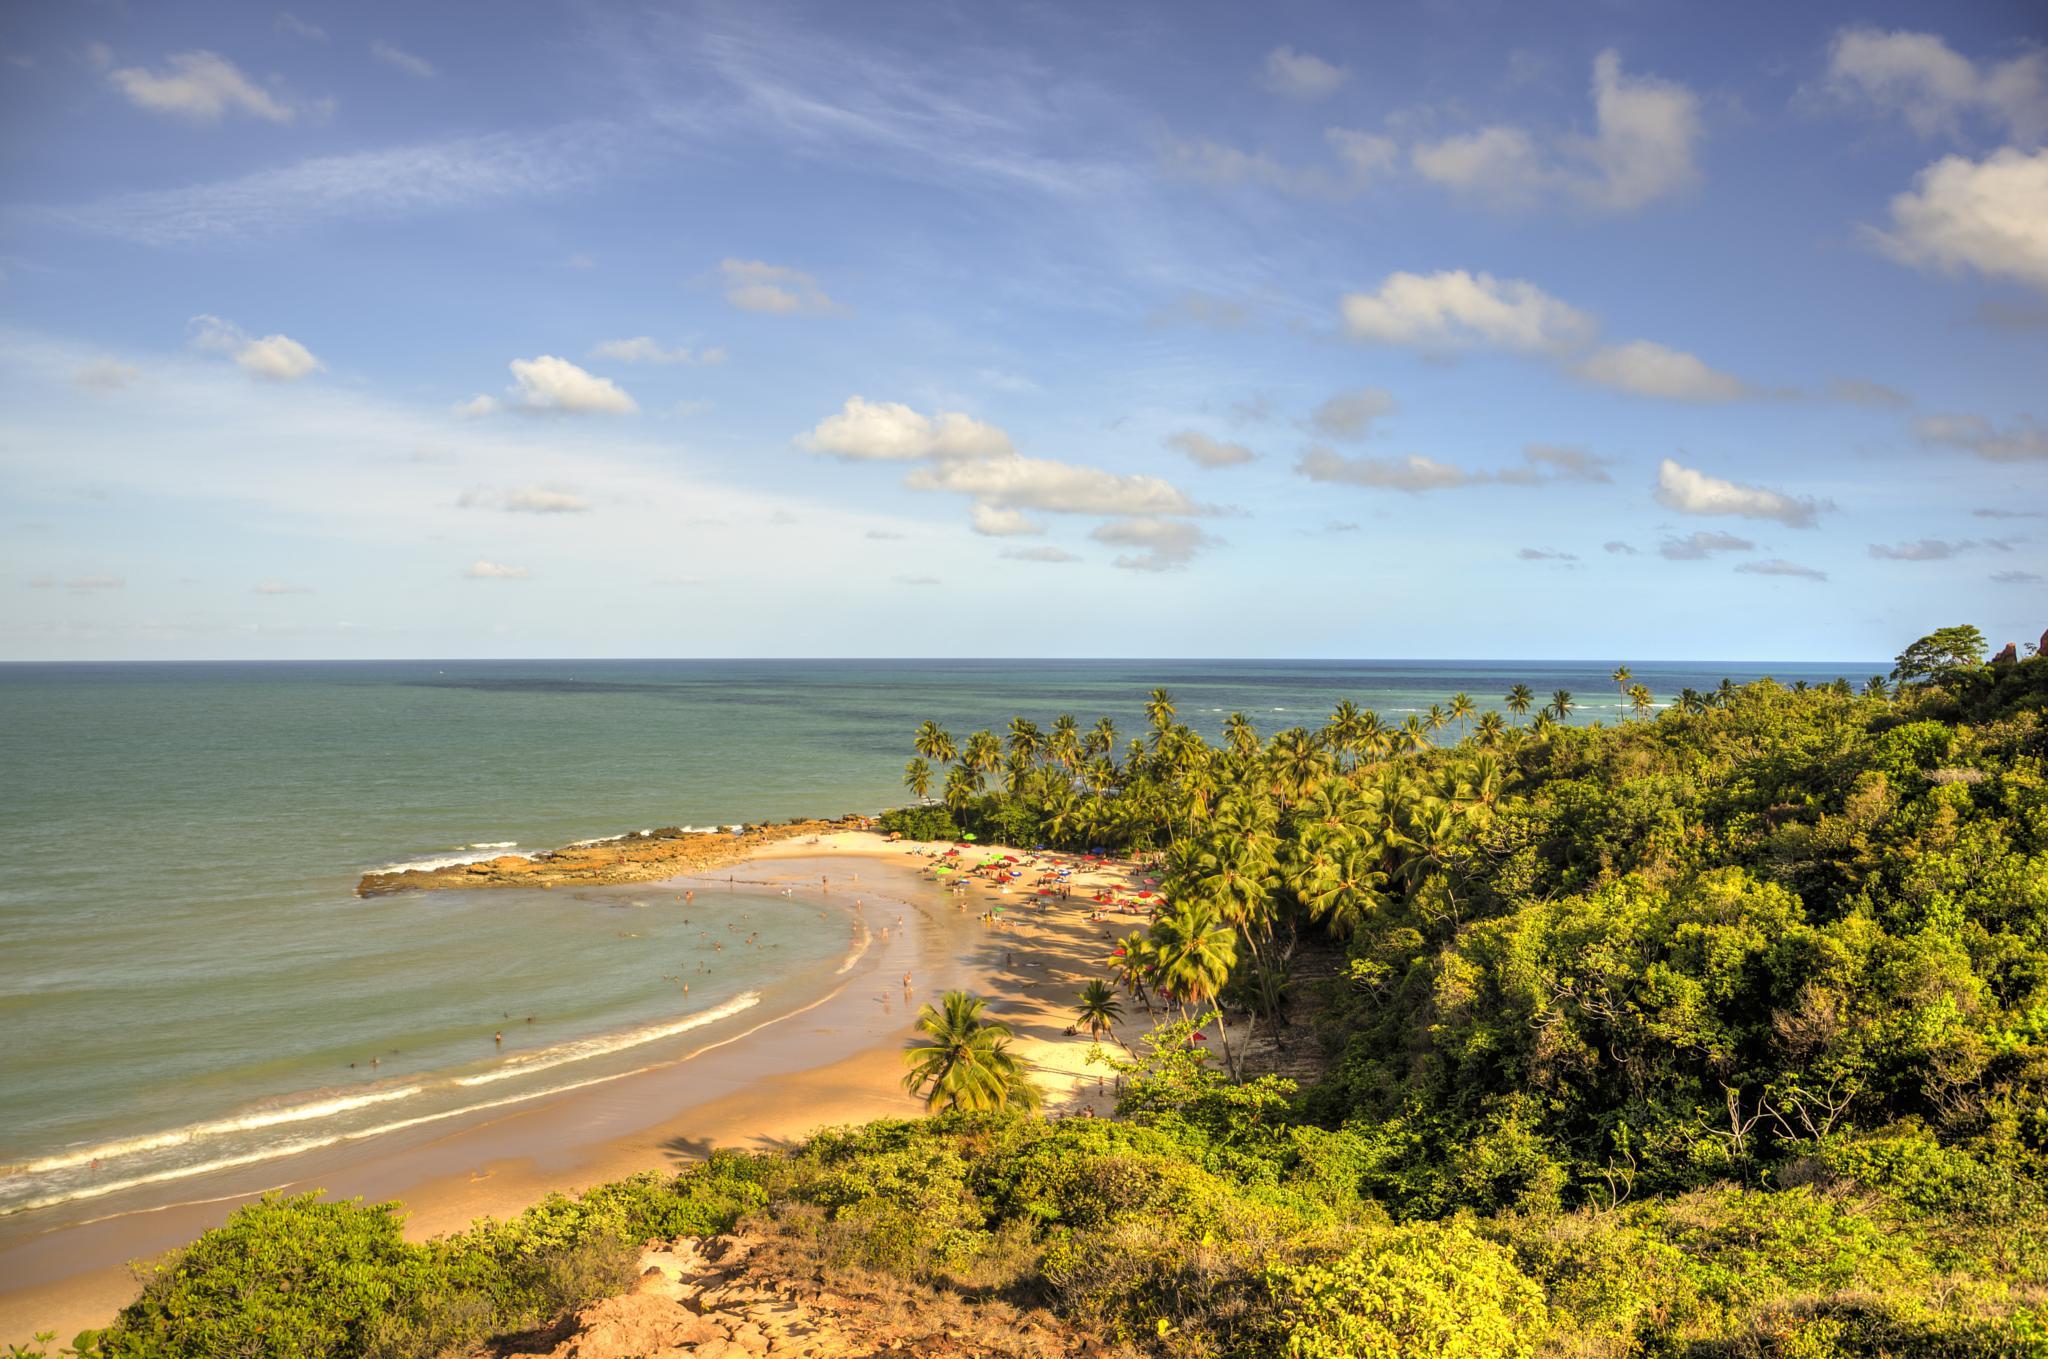 Praia de Coquerinhos by Kinsley Emanuel